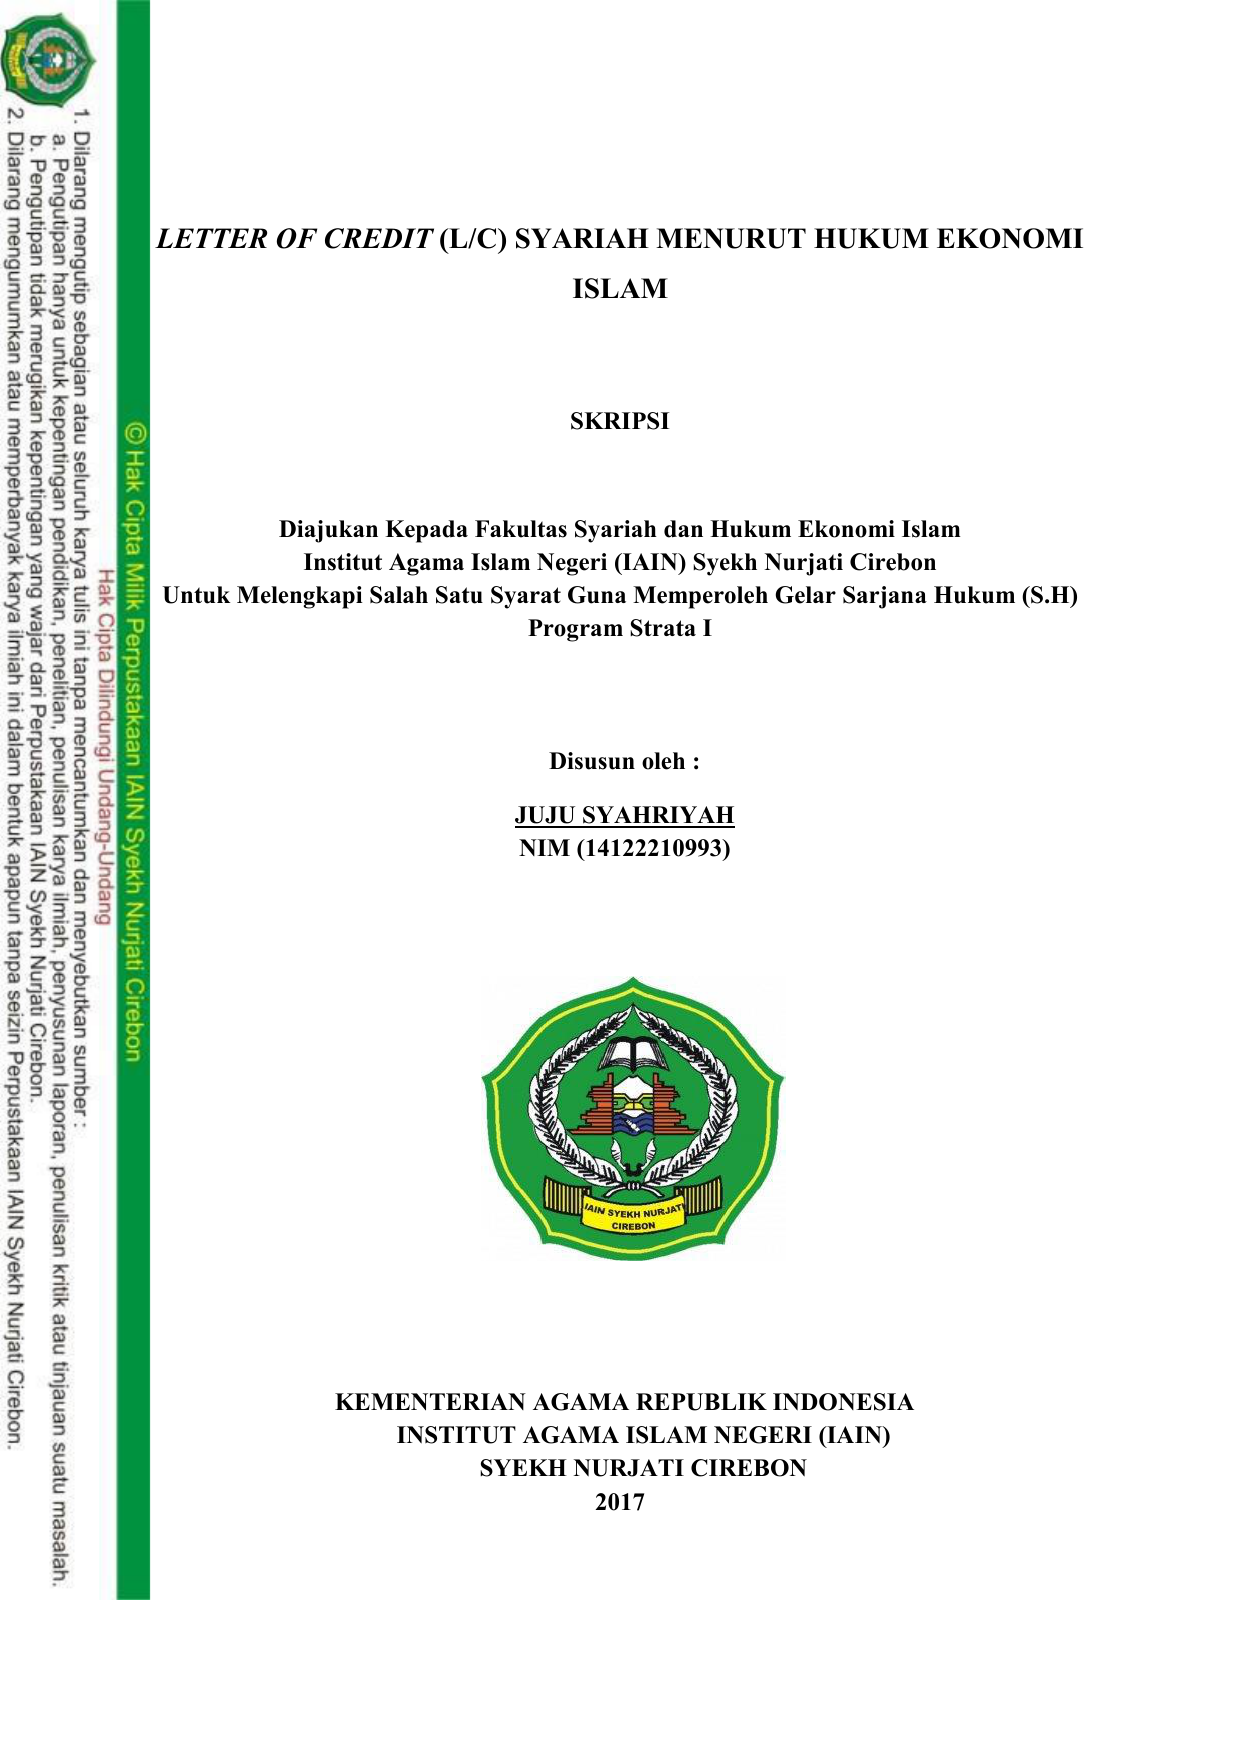 Contoh Tesis Ekonomi Syariah Contoh Soal Dan Materi Pelajaran 10